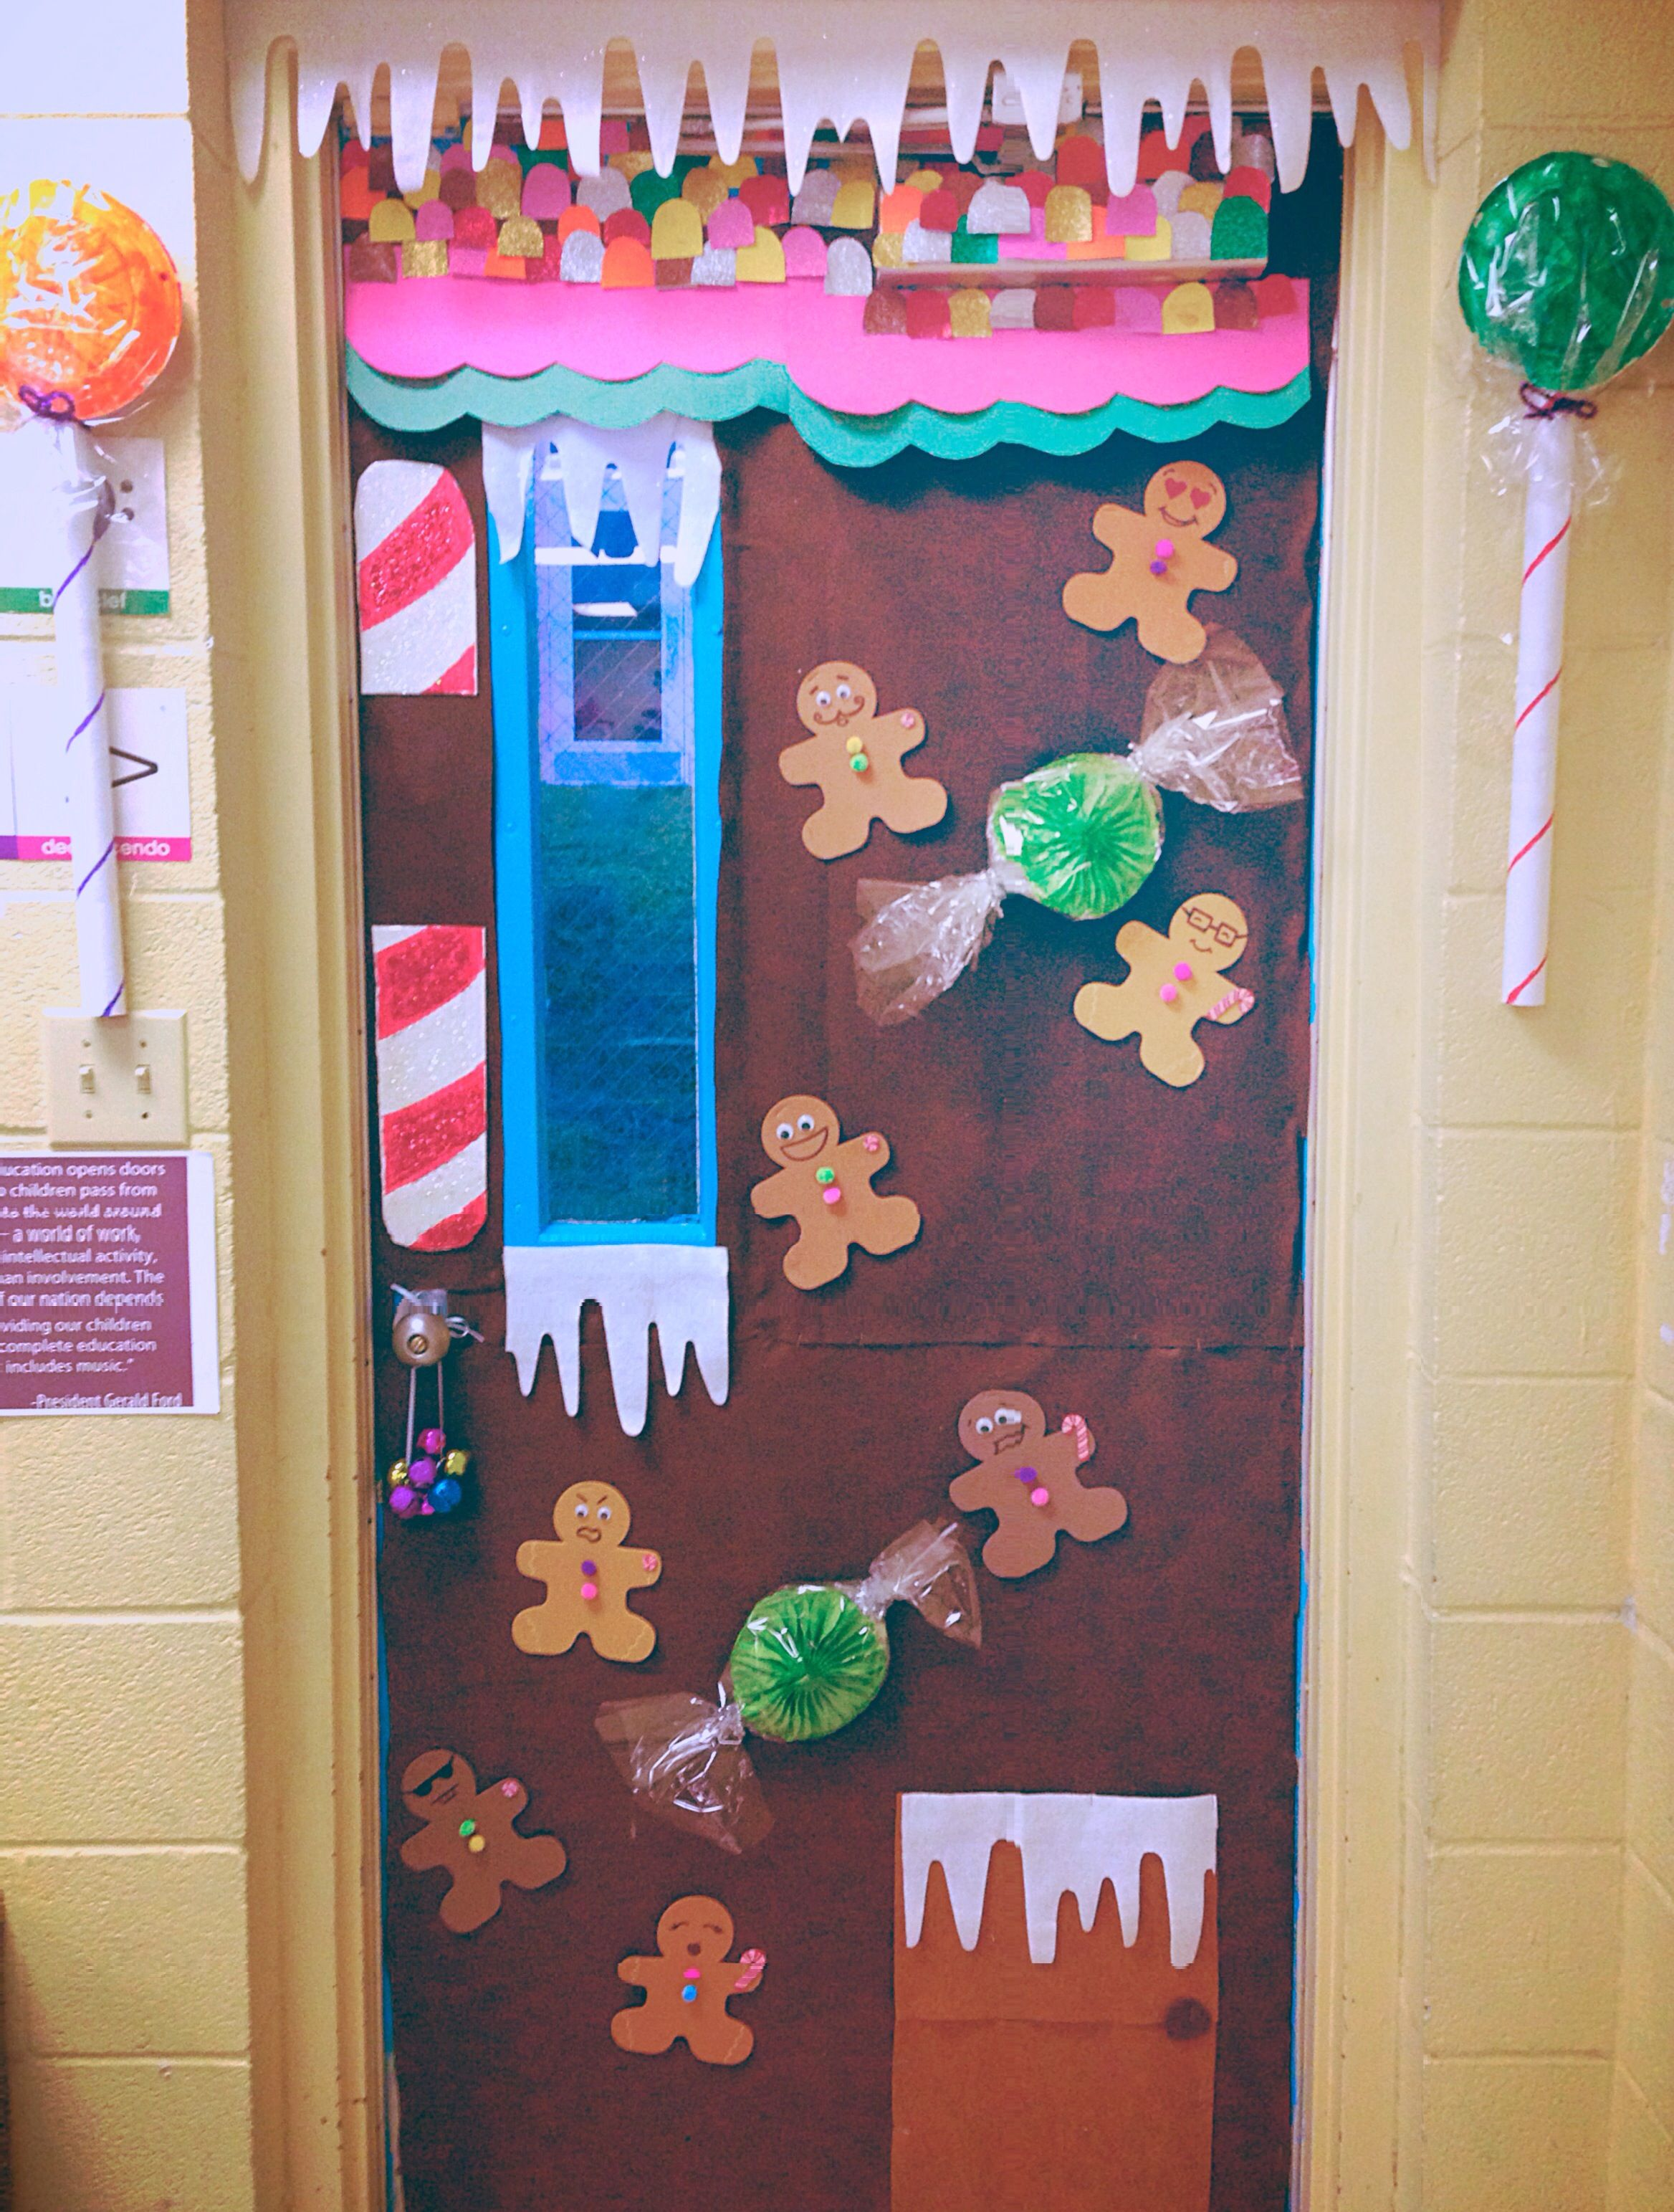 Candyland Christmas Door Decoration Ideas : Pin by claudia amaya cervantes on preschool bulletin